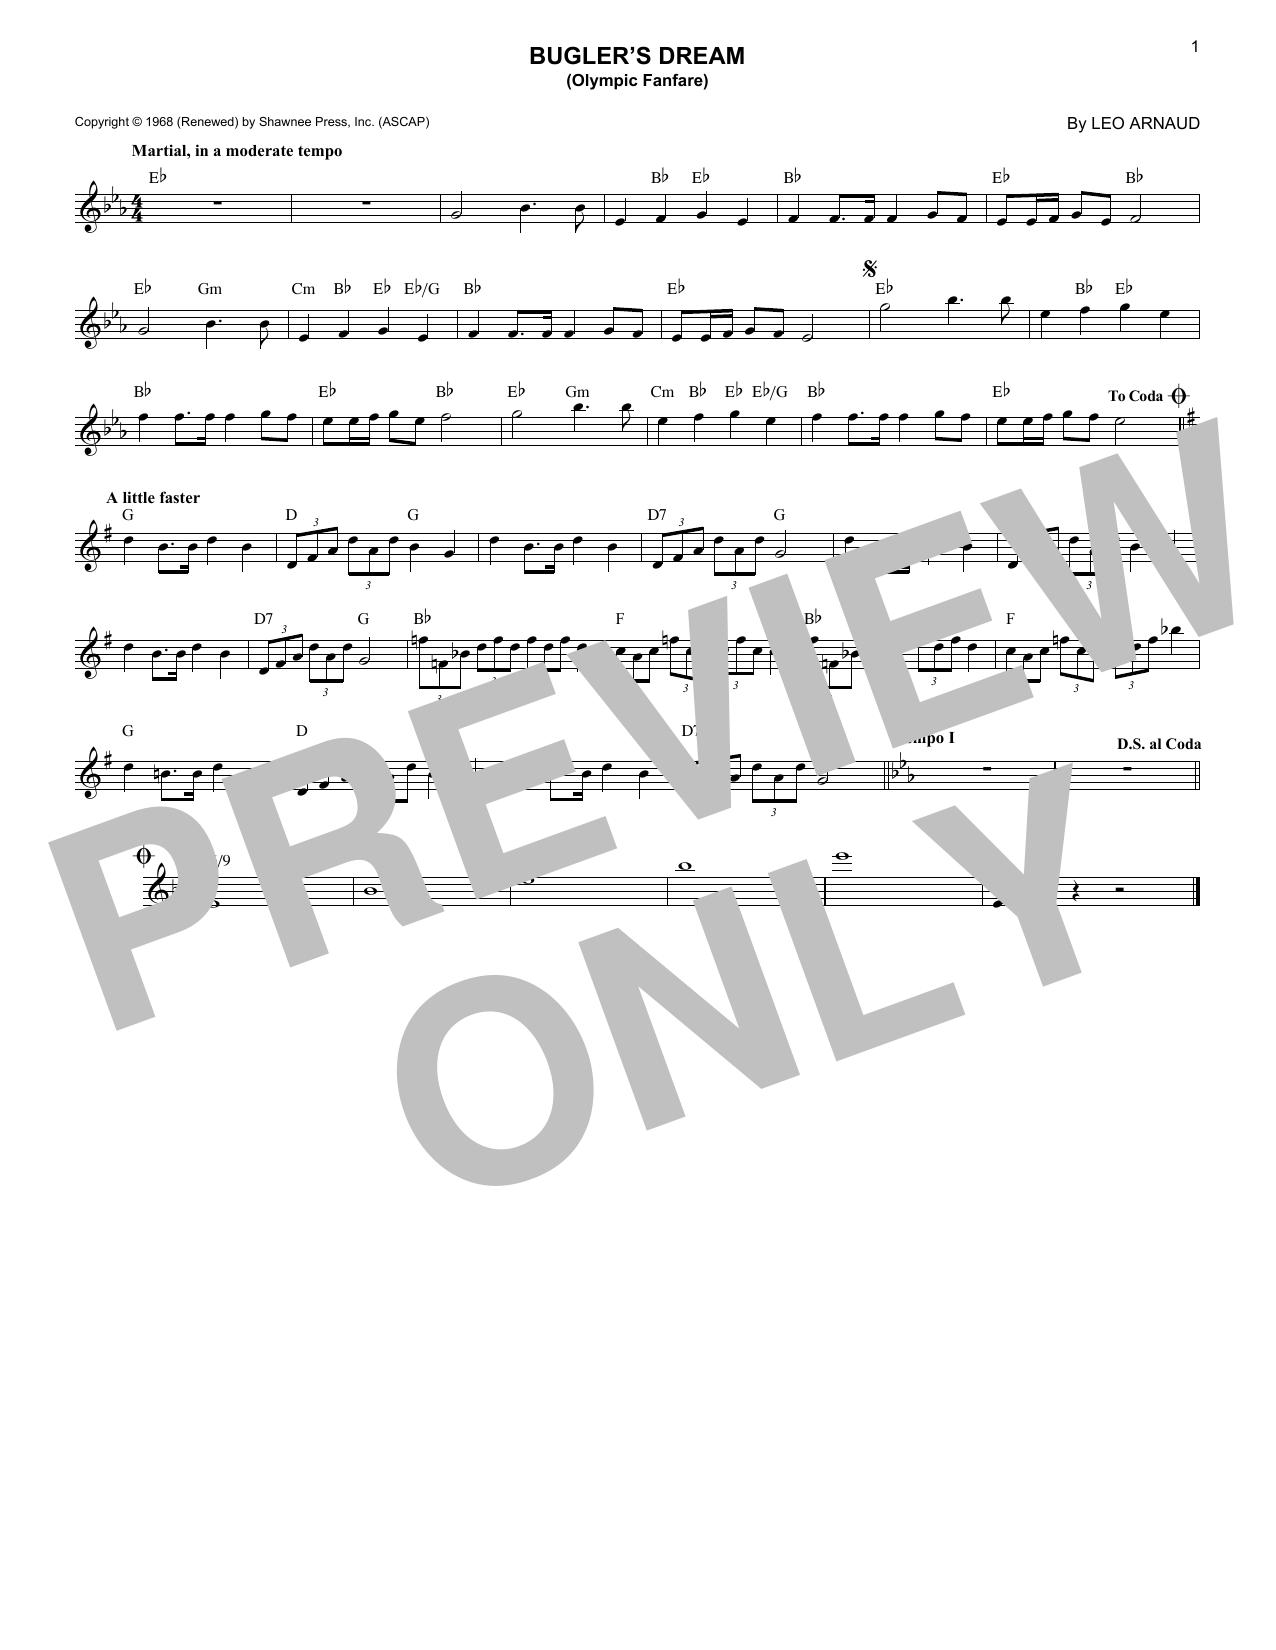 Bugler's Dream (Olympic Fanfare) (Lead Sheet / Fake Book)